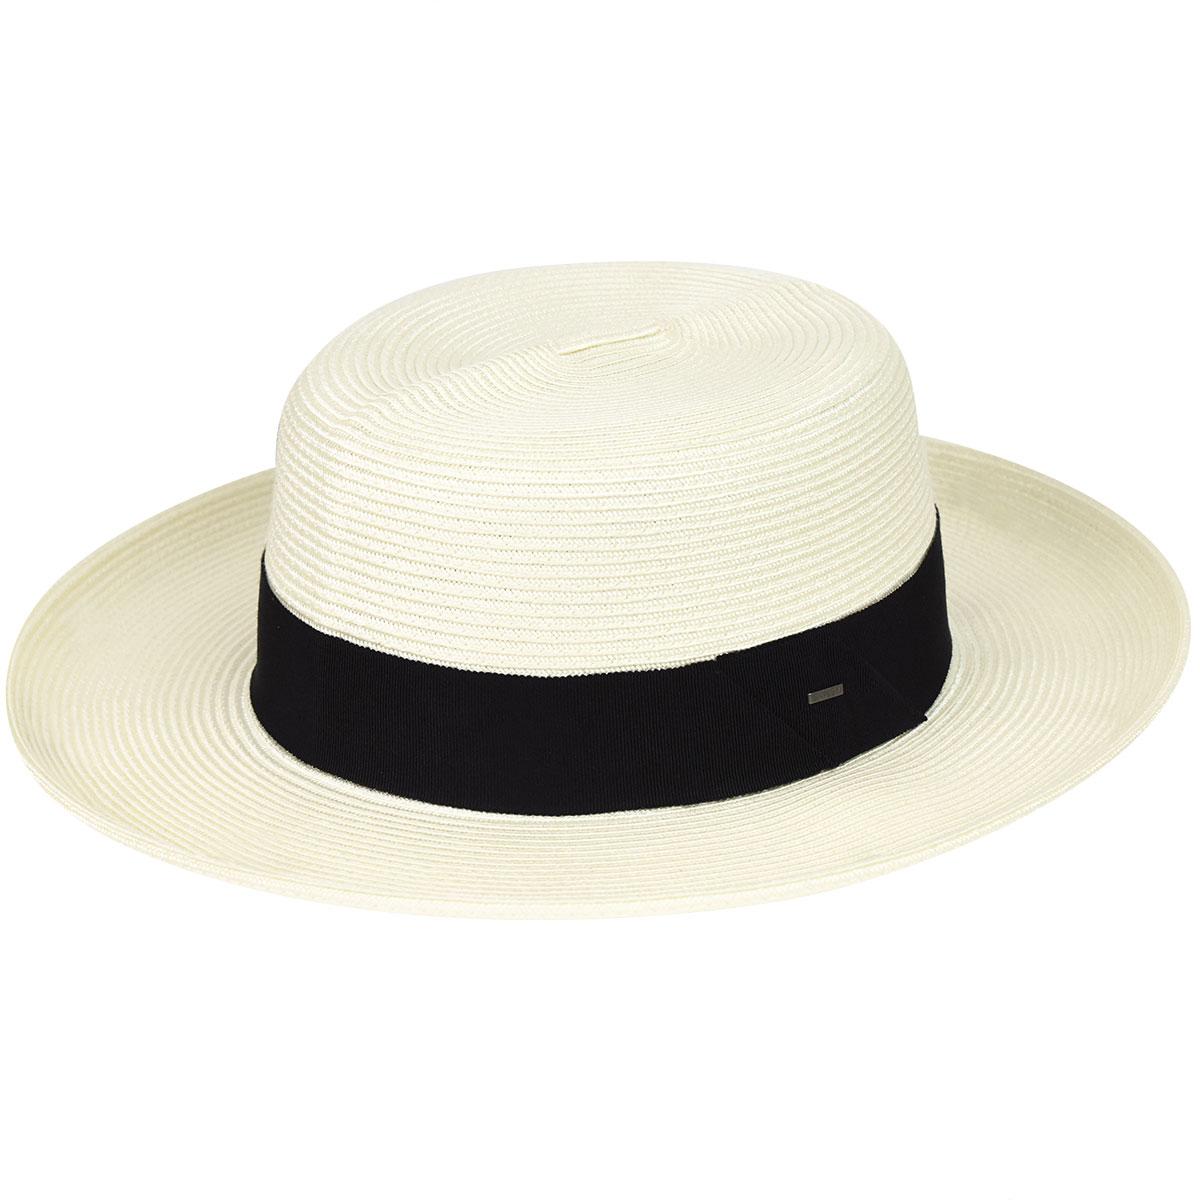 1920s Mens Hats & Caps | Gatsby, Peaky Blinders, Gangster Tim Pork Pie $70.00 AT vintagedancer.com